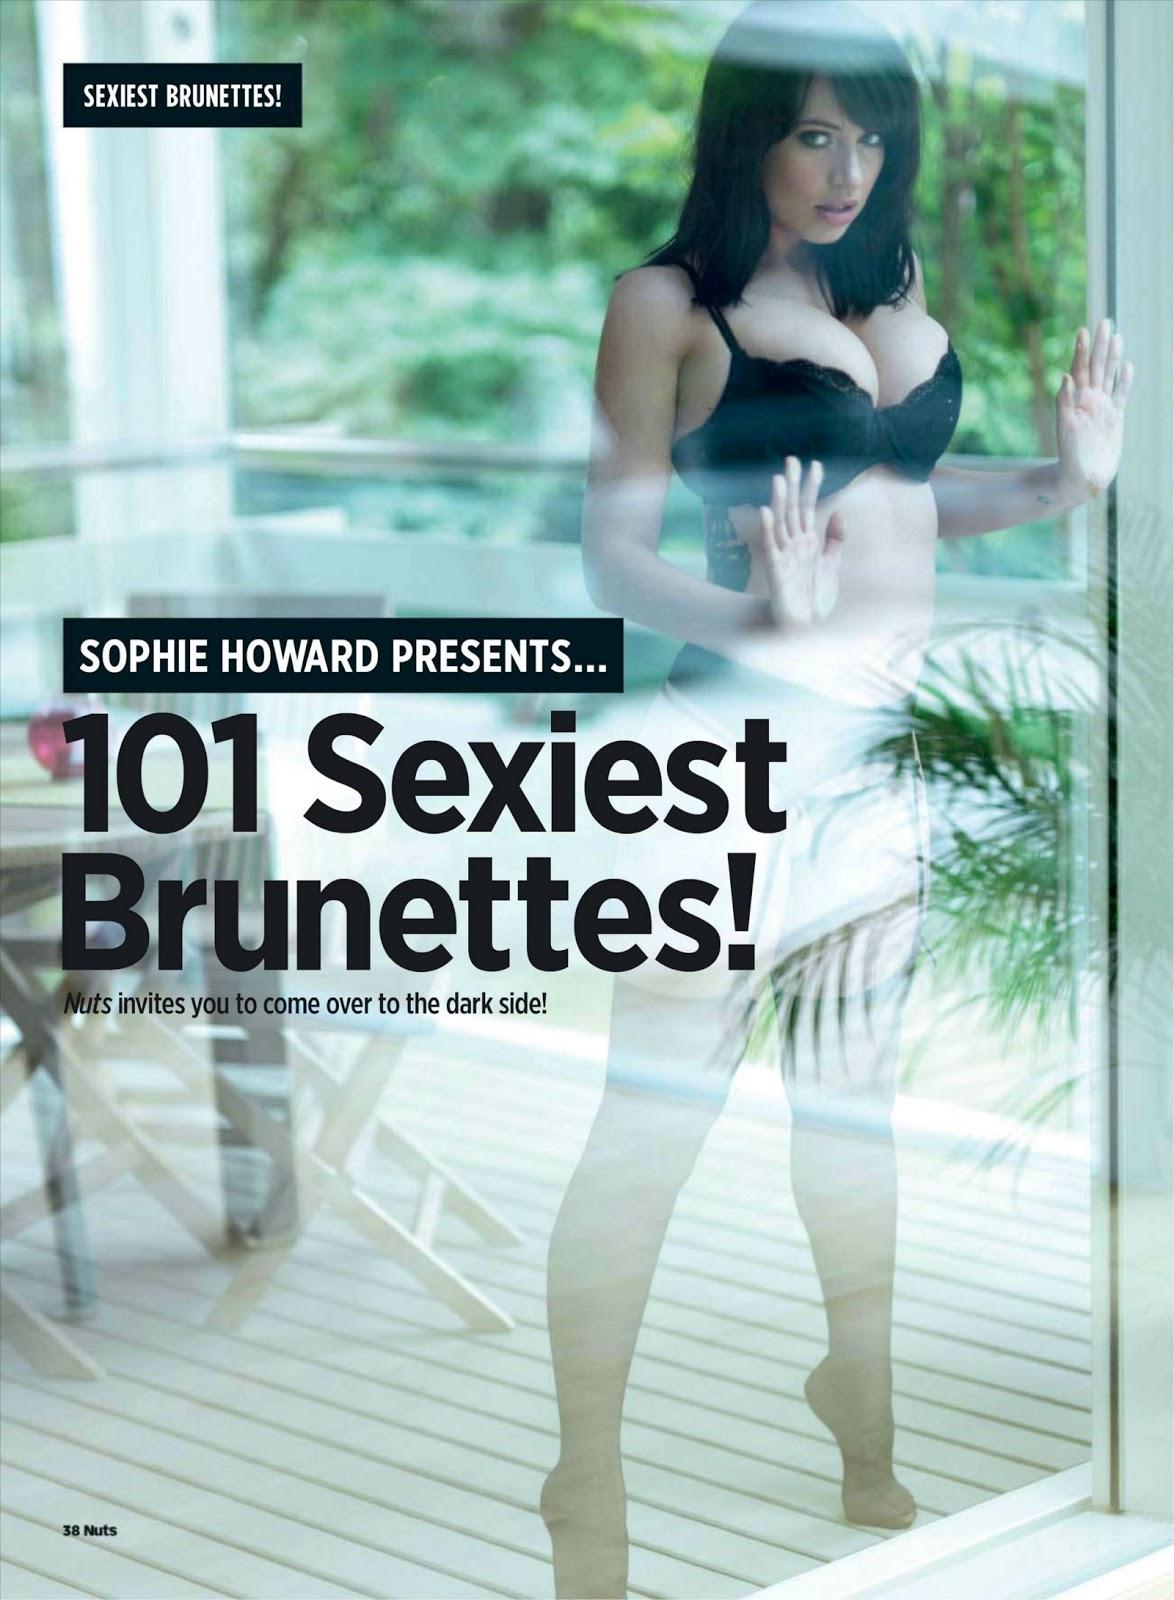 http://1.bp.blogspot.com/--dYo1OIS1qI/TqQNKgdJ5II/AAAAAAAAA7E/jVVrkjh4OOo/s1600/Sophie-Howard-7Sophie+Howard+%25E2%2580%2593+Nuts+Magazine+%2528October+2011%2529+%2528NSFW%2529.jpg